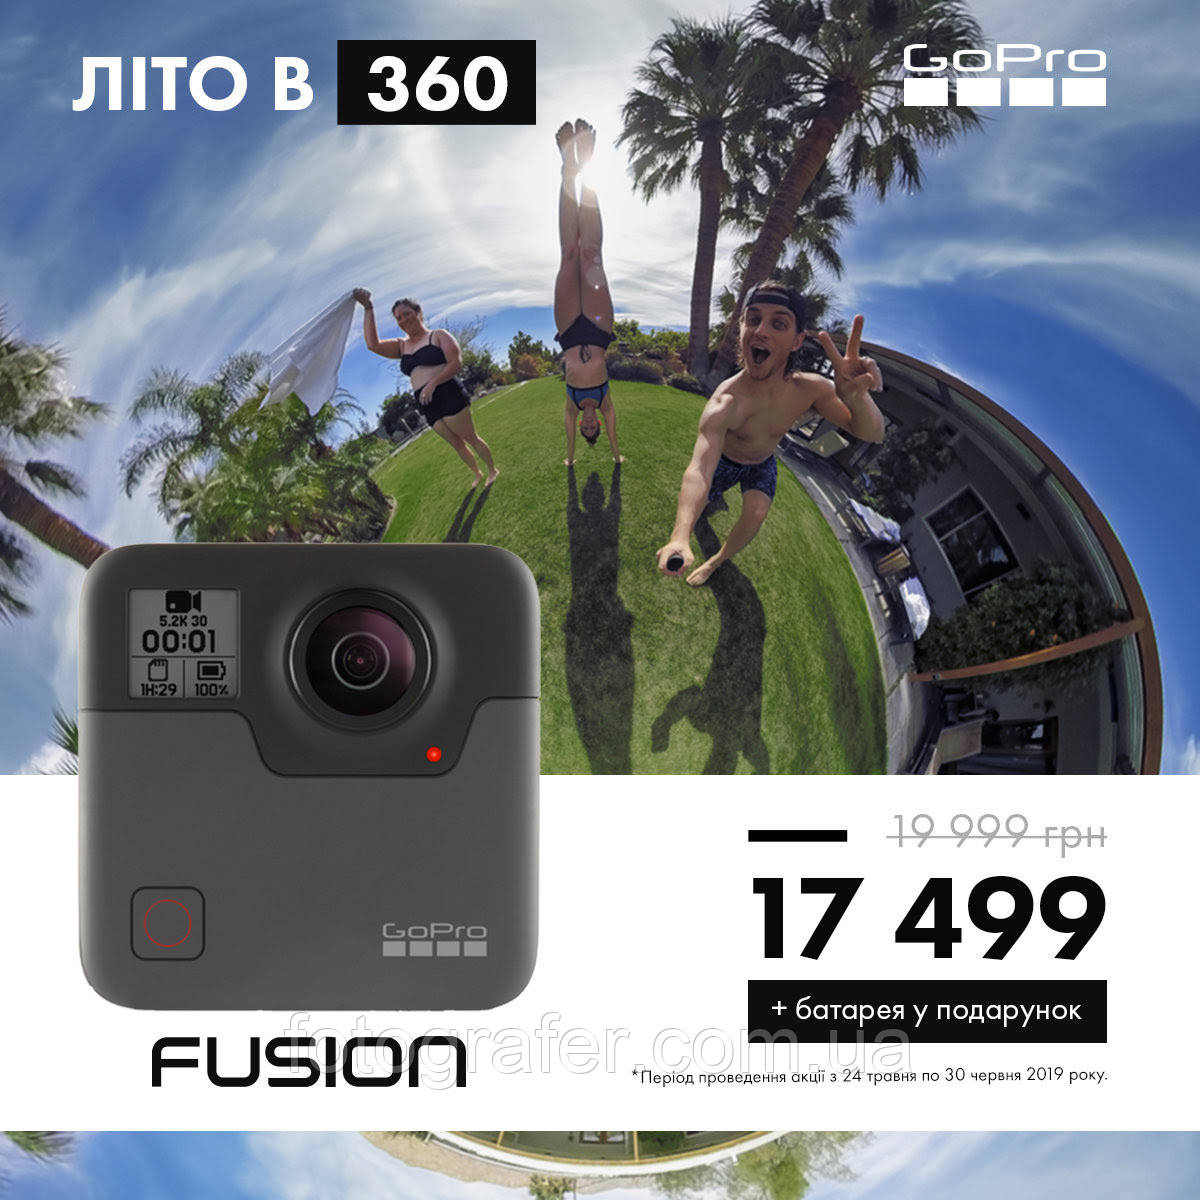 Лето в 360 с камерой GoPro Fusion